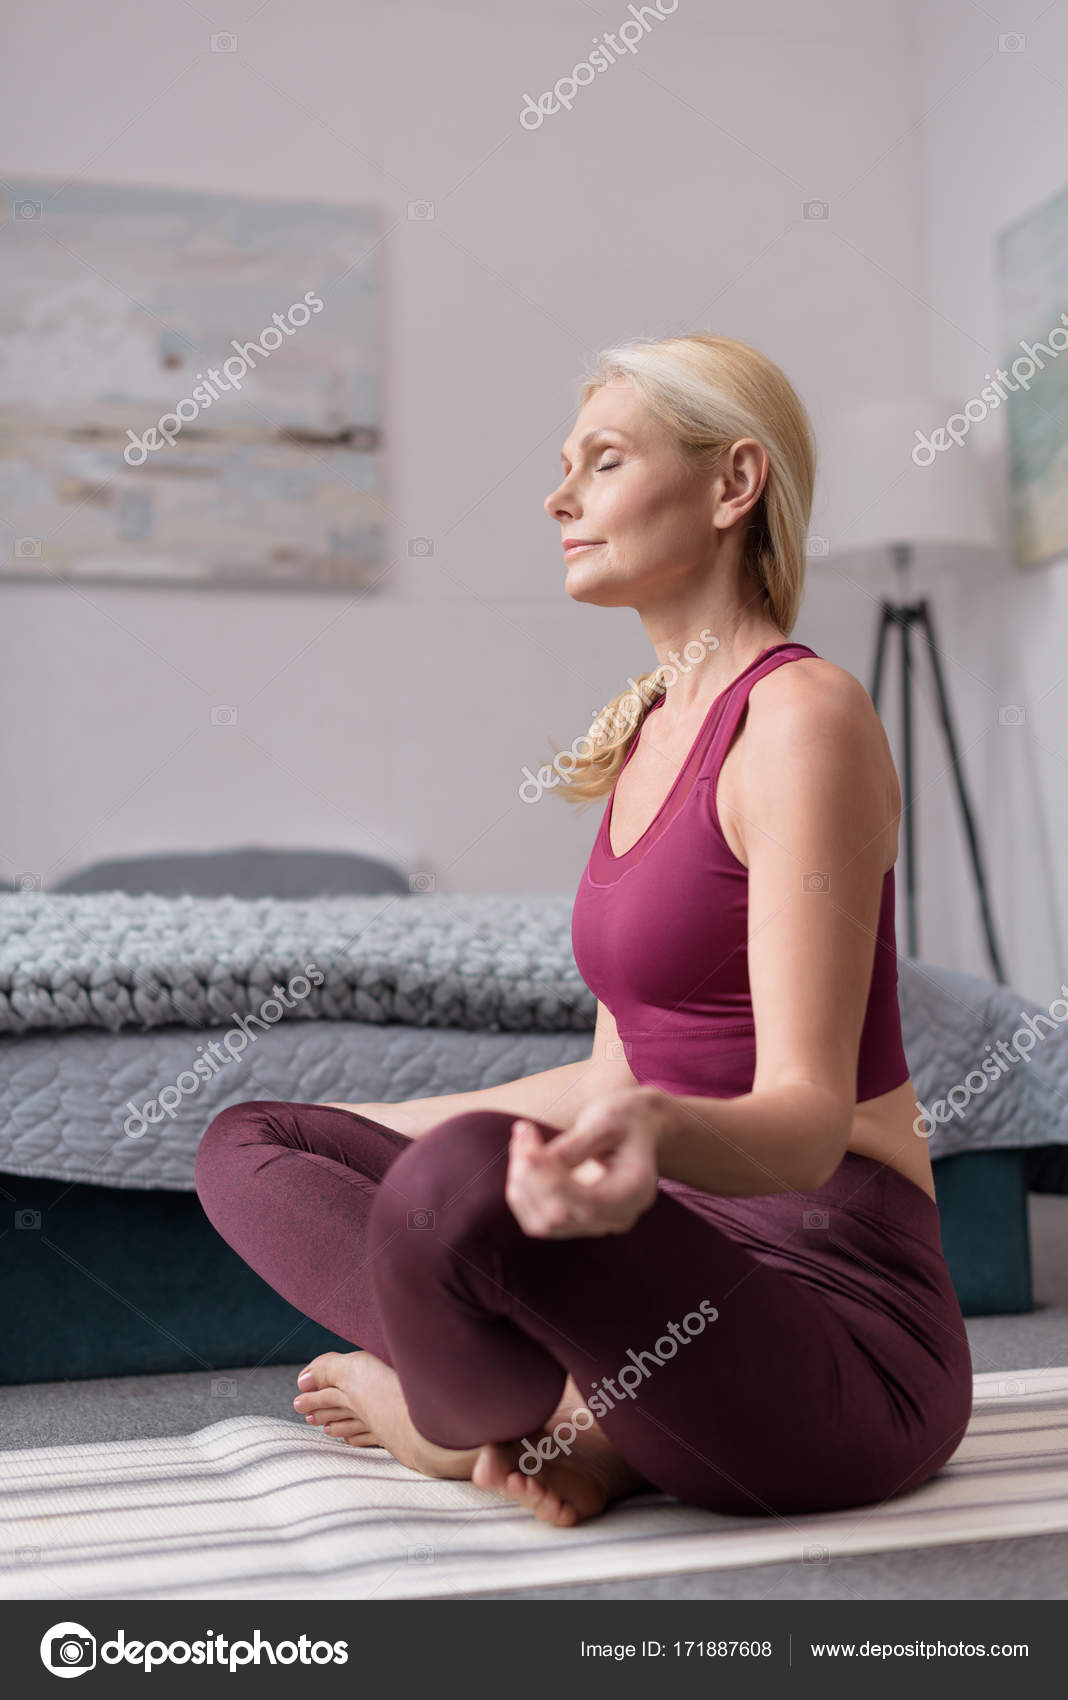 yoga pratiquer la maison de la femme photographie vitalikradko 171887608. Black Bedroom Furniture Sets. Home Design Ideas